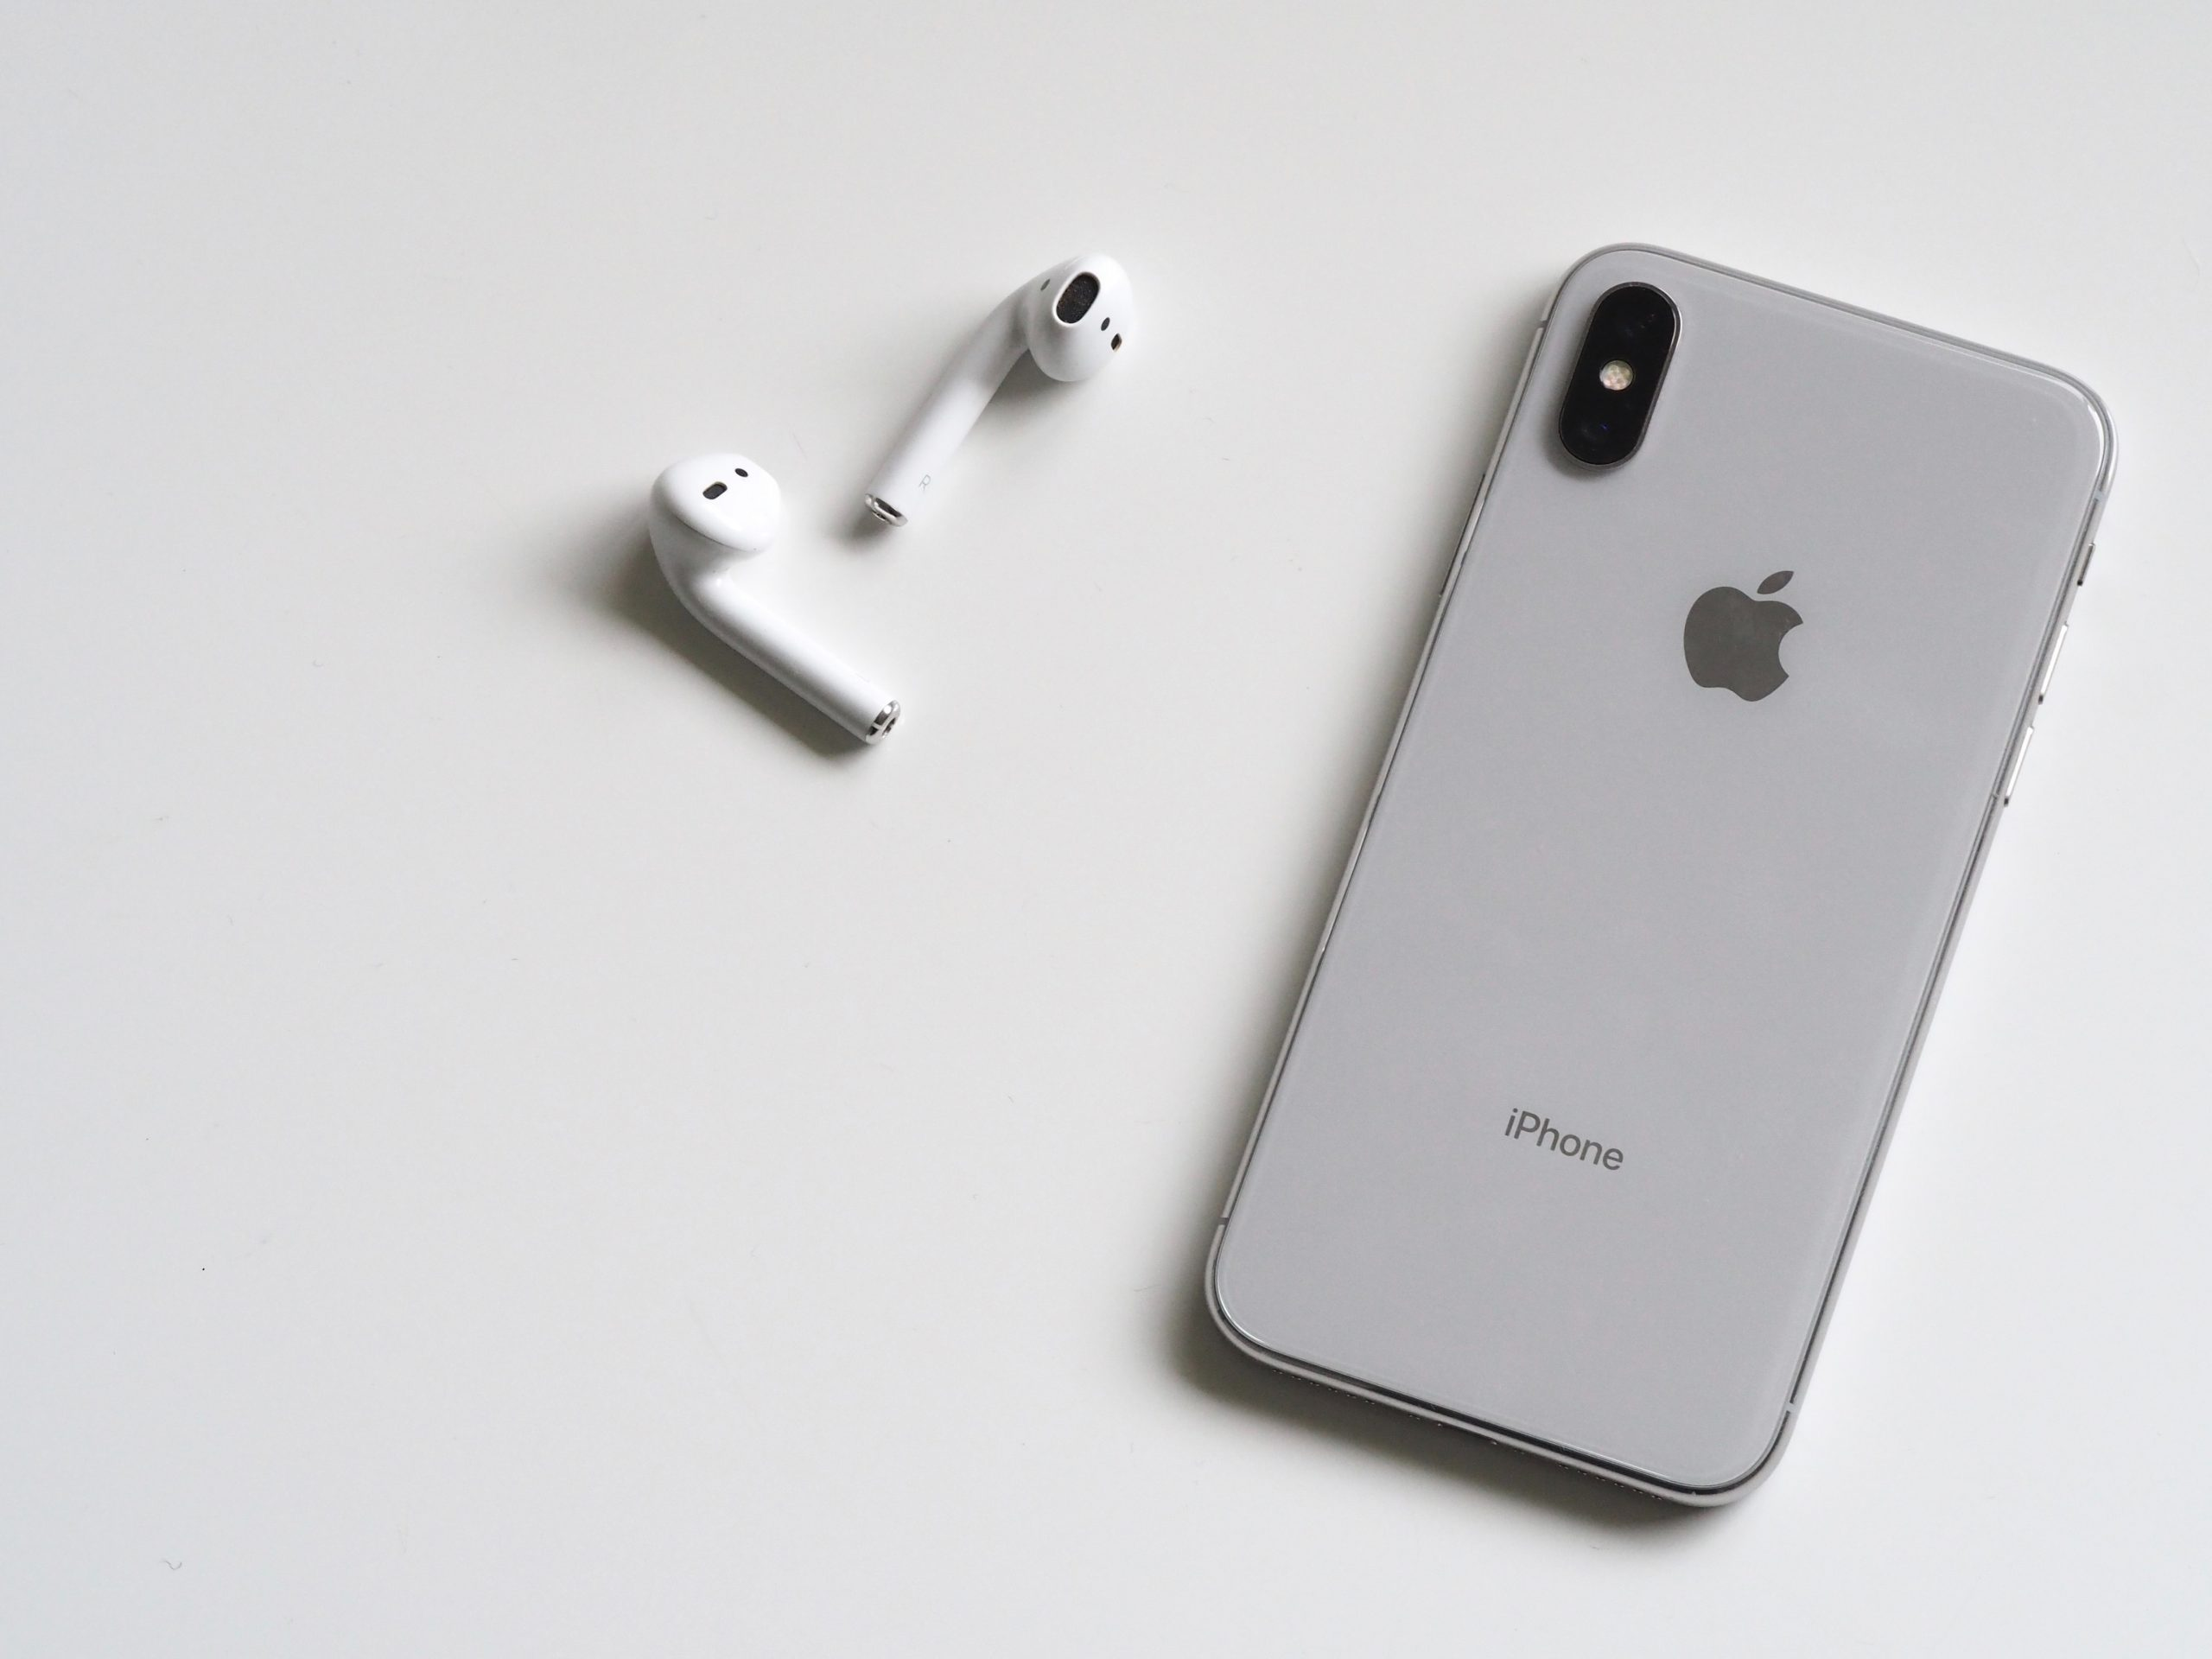 best-free-phones-no-credit-card-needed